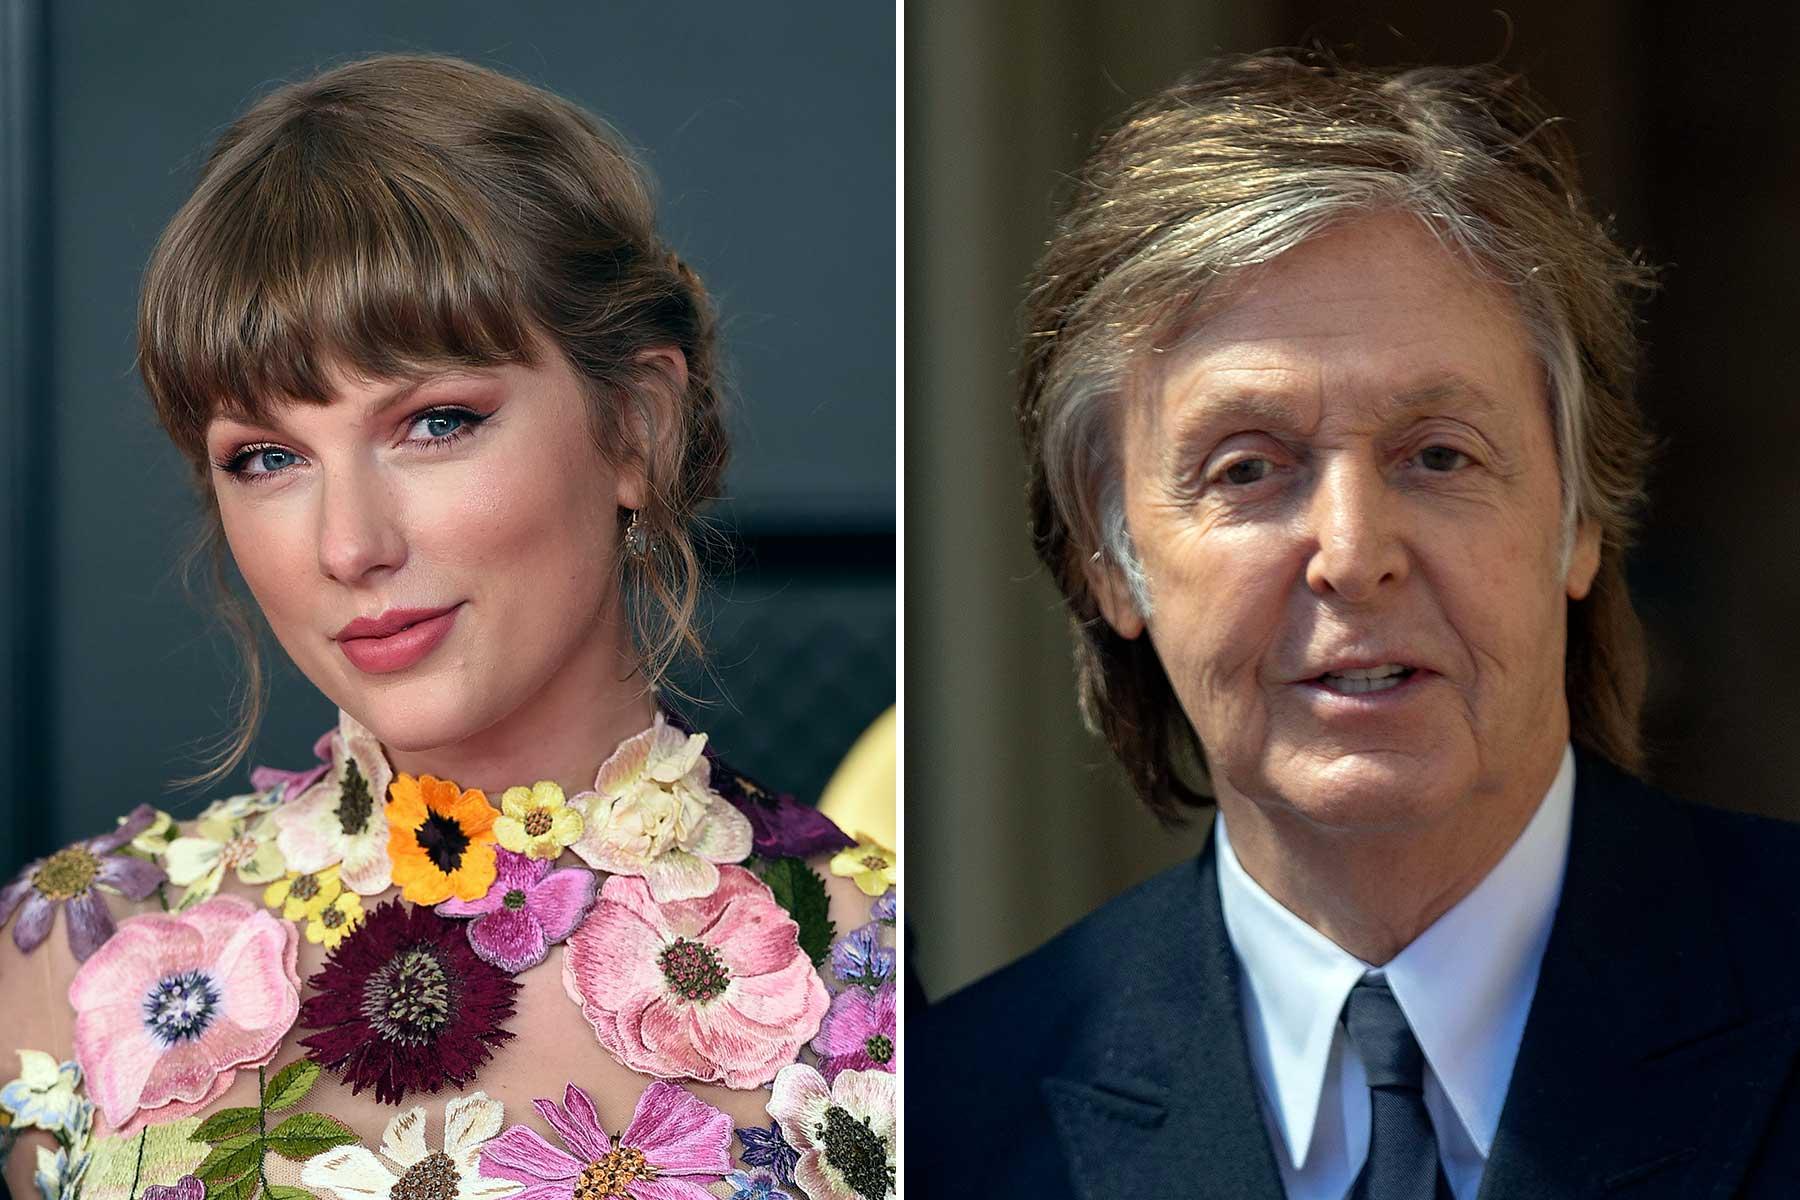 Taylor Swift, Paul McCartney, Drew Barrymore to Speak at HOF Ceremony